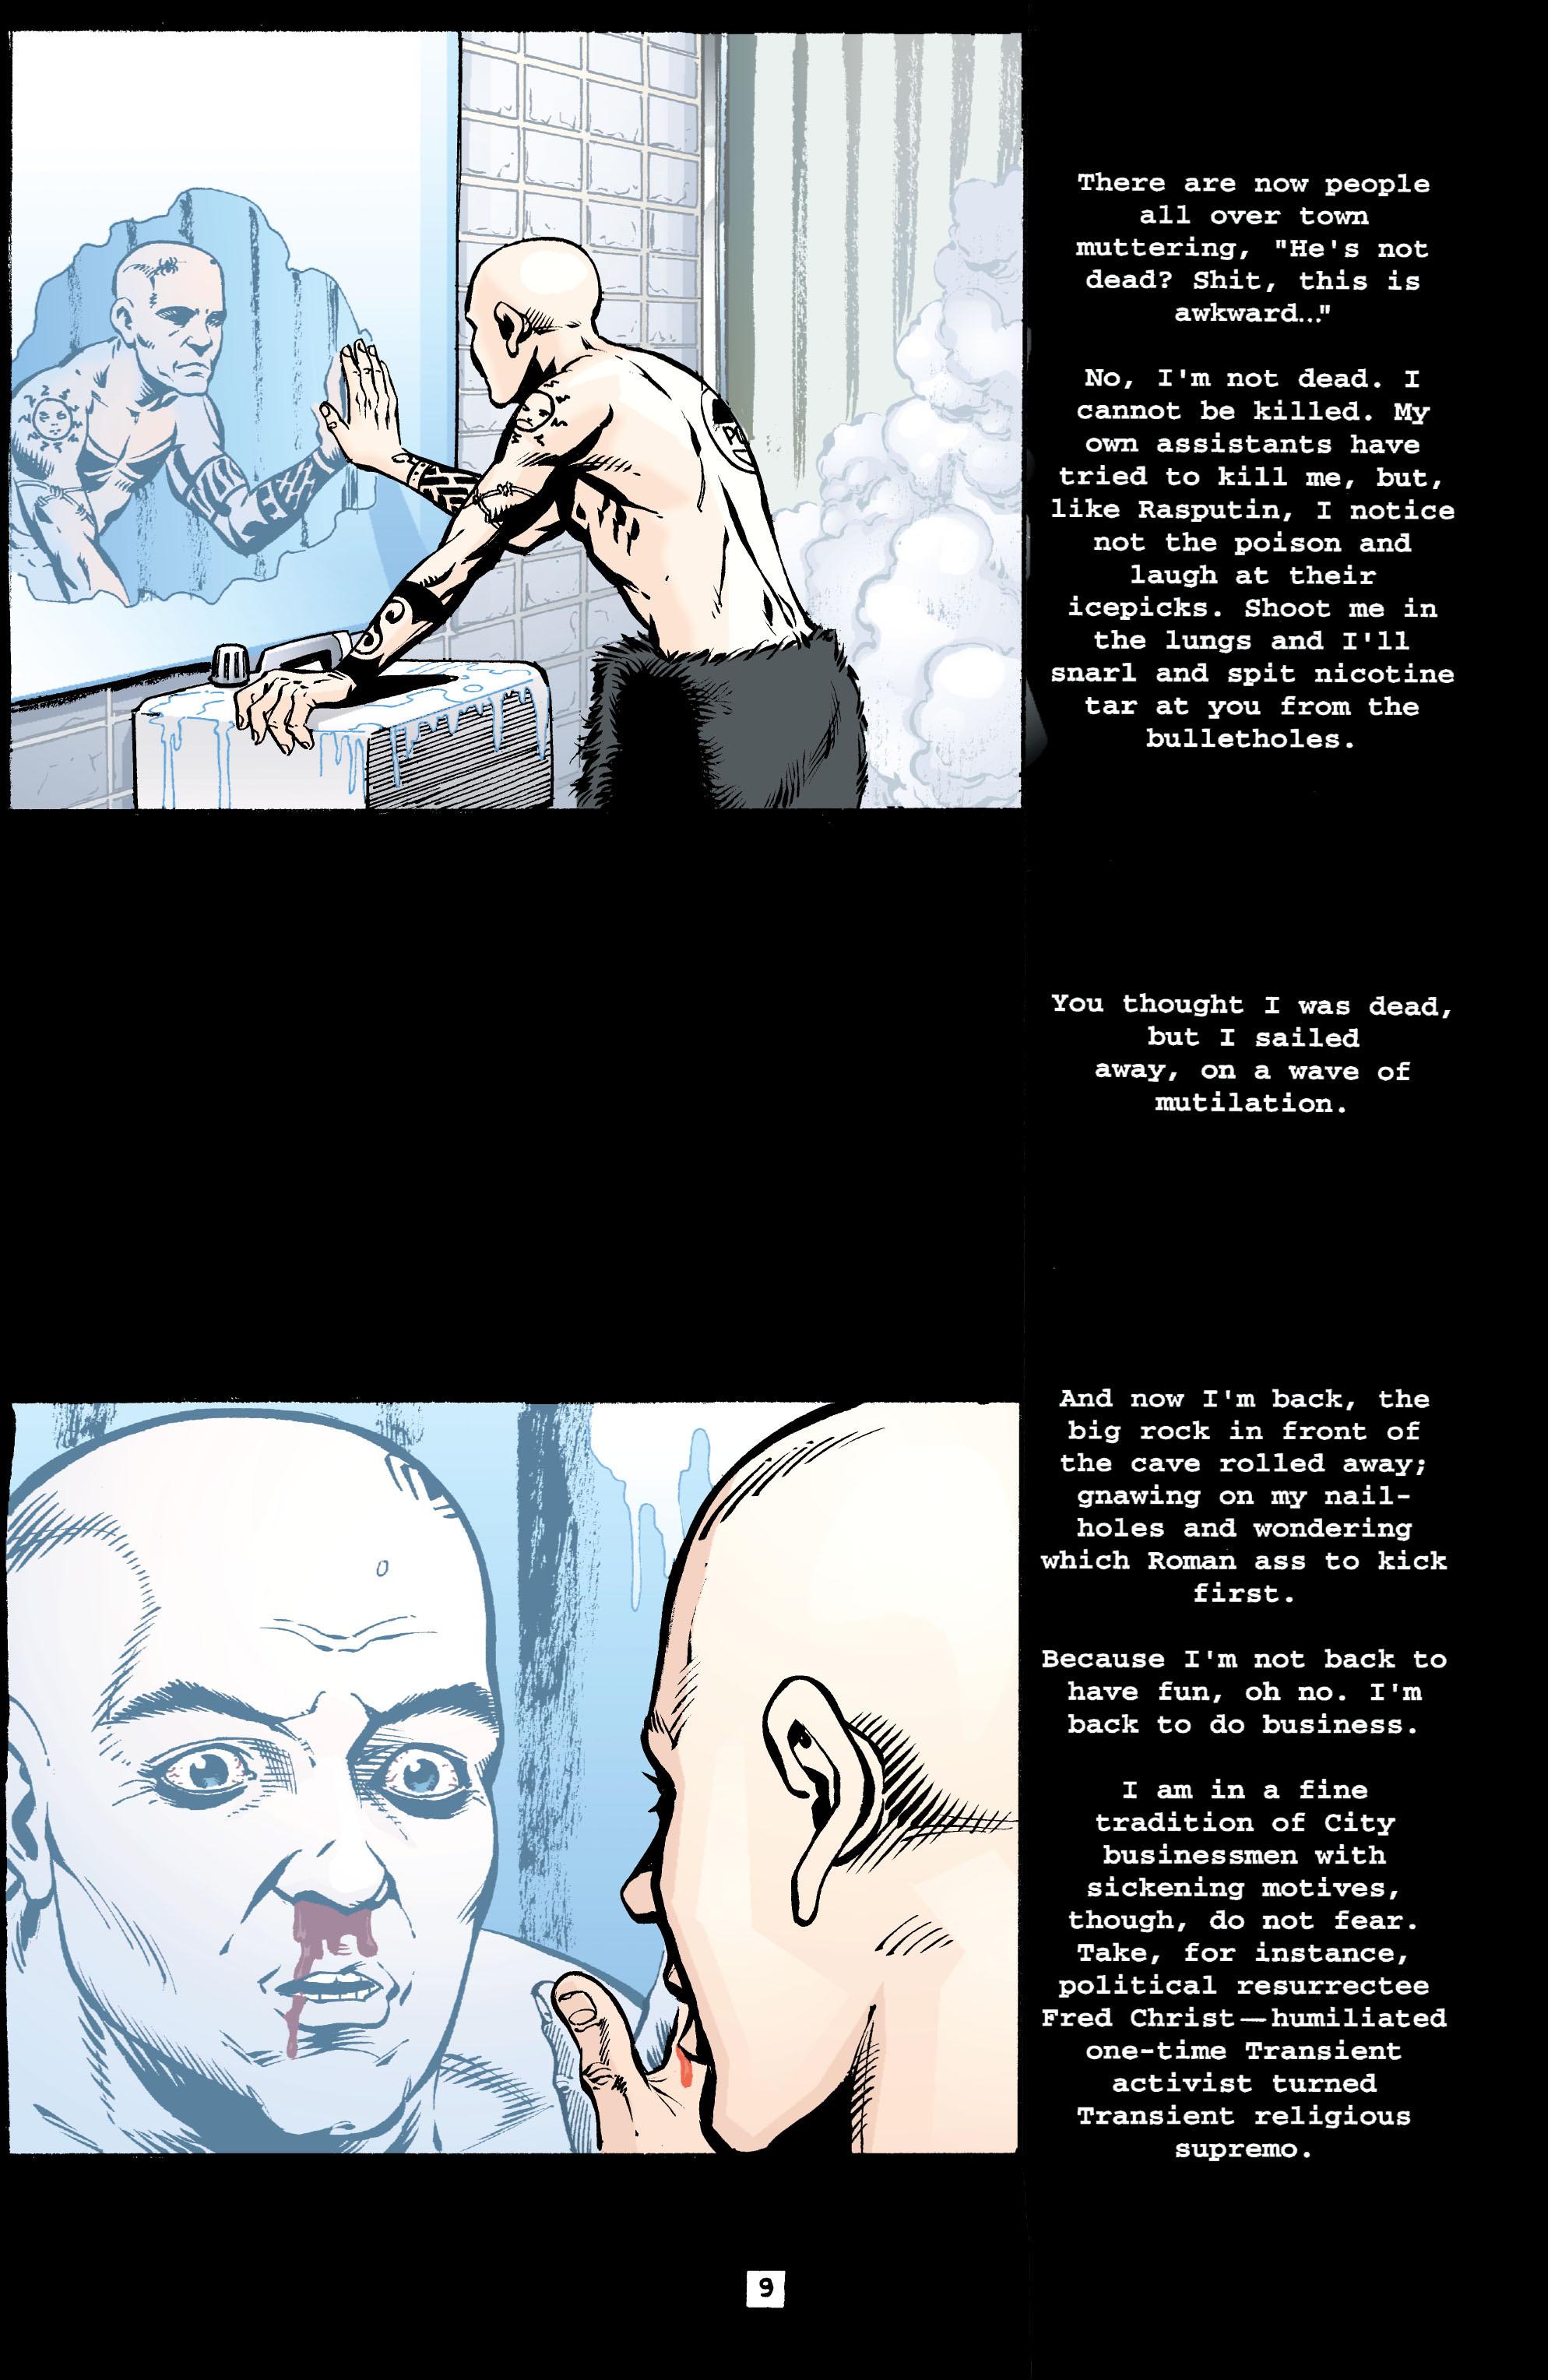 Read online Transmetropolitan comic -  Issue #39 - 10